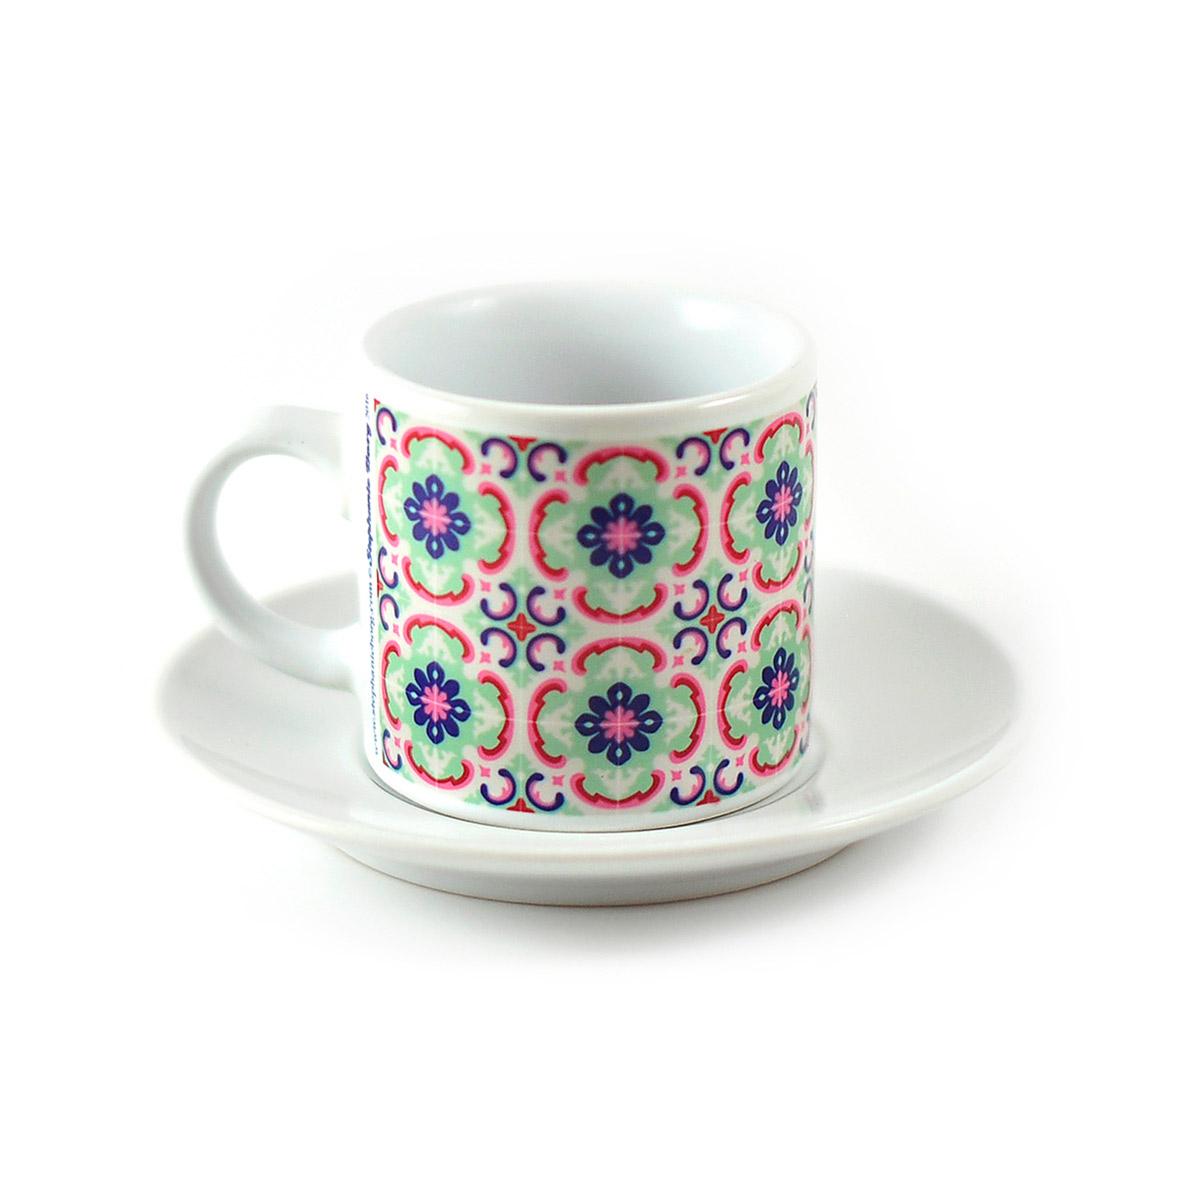 Malta Tile Espresso Cup & Saucer, pattern no.1